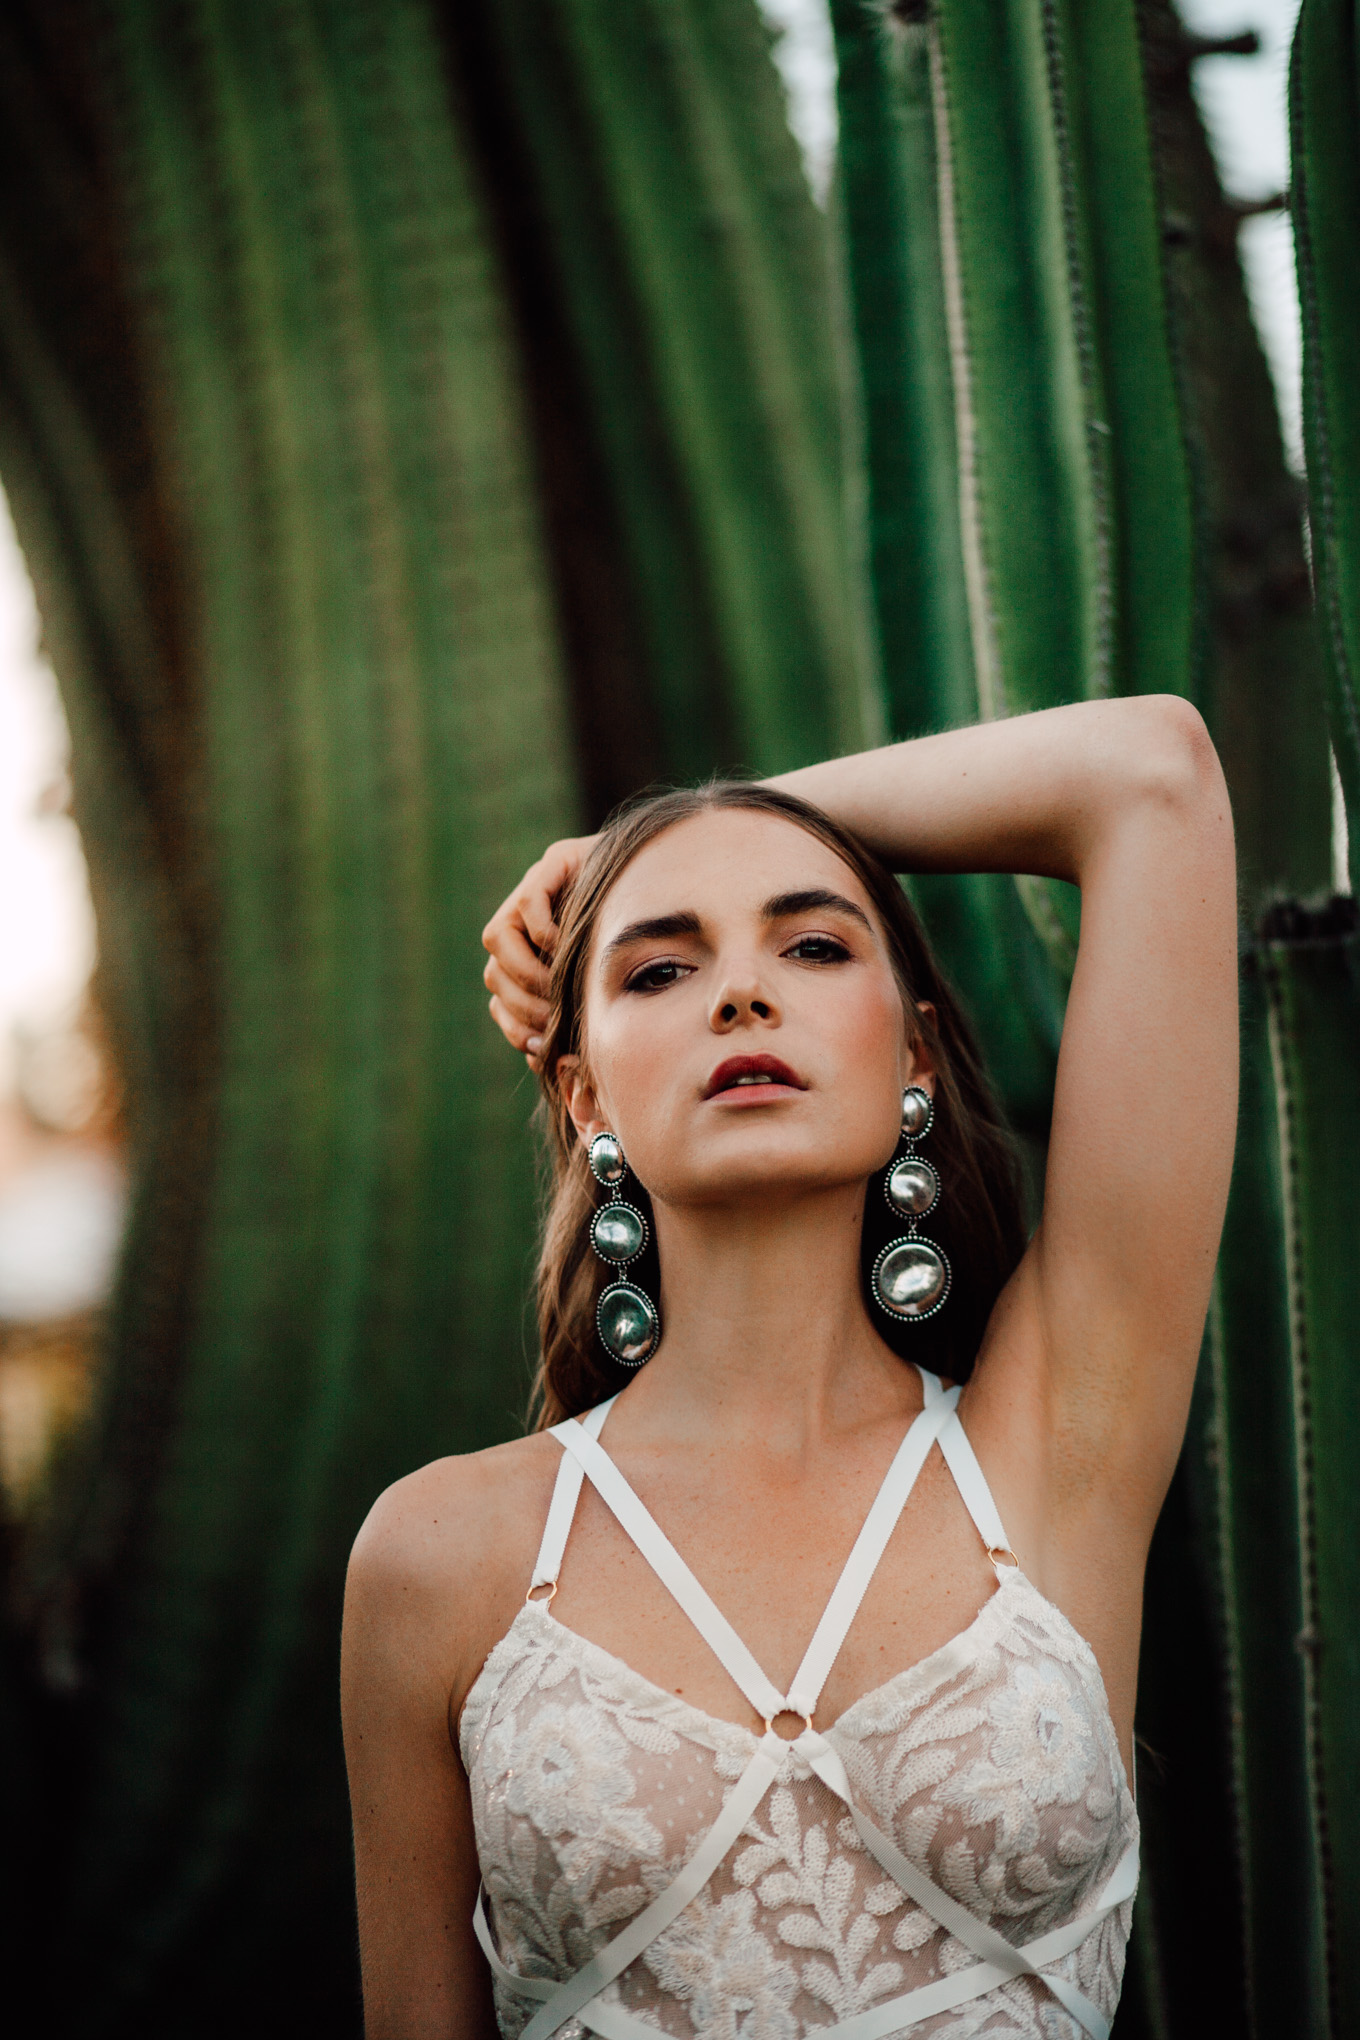 Cape-Town-Pia-Anna-Christian-Wedding-Photography-South-Africa-Bride-Cactus-13.jpg